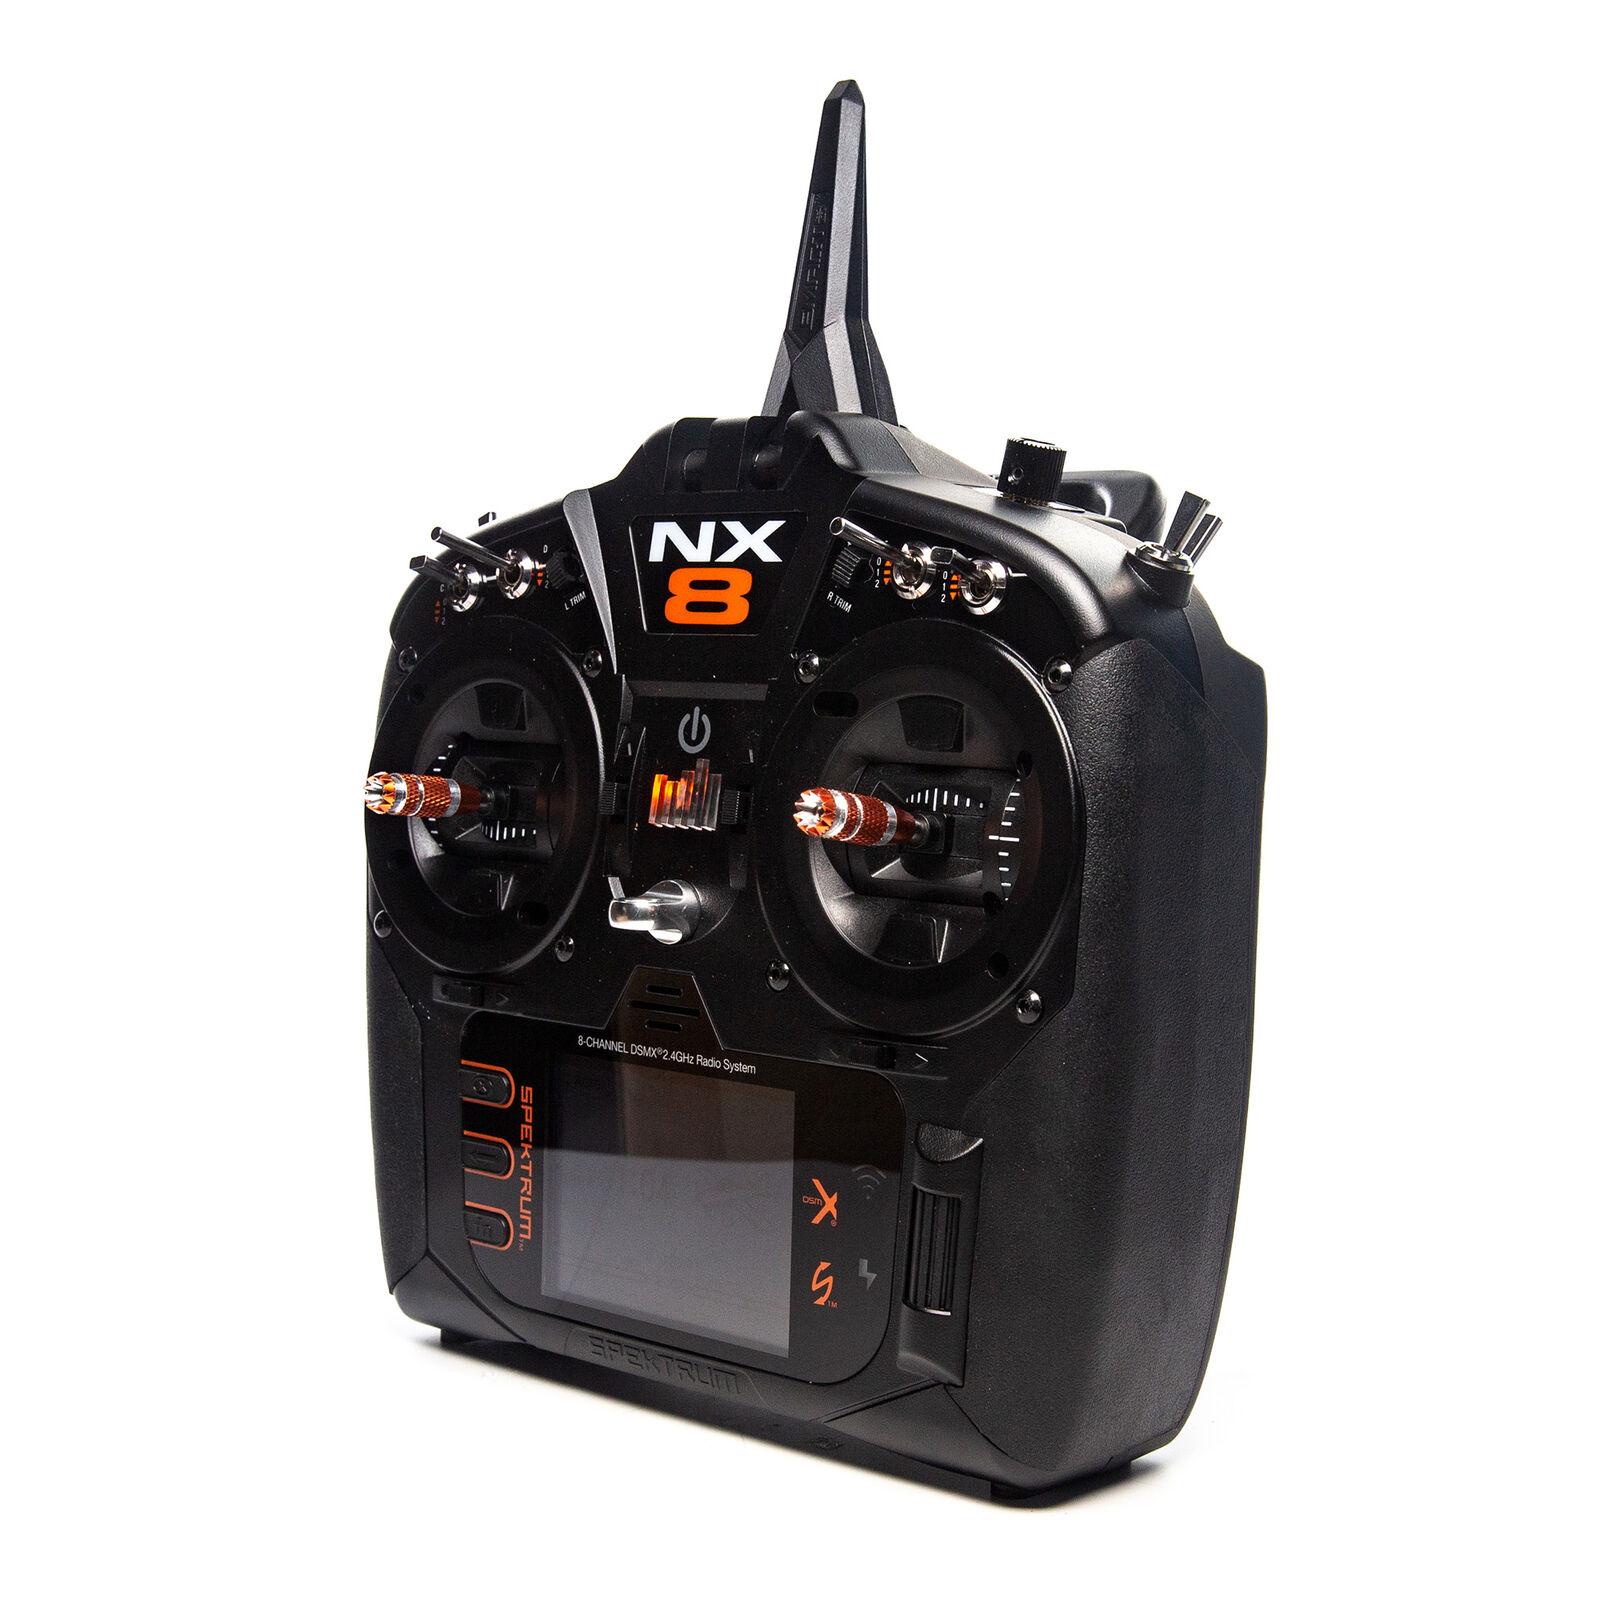 NX8 8-Channel DSMX Transmitter Only, Intl.